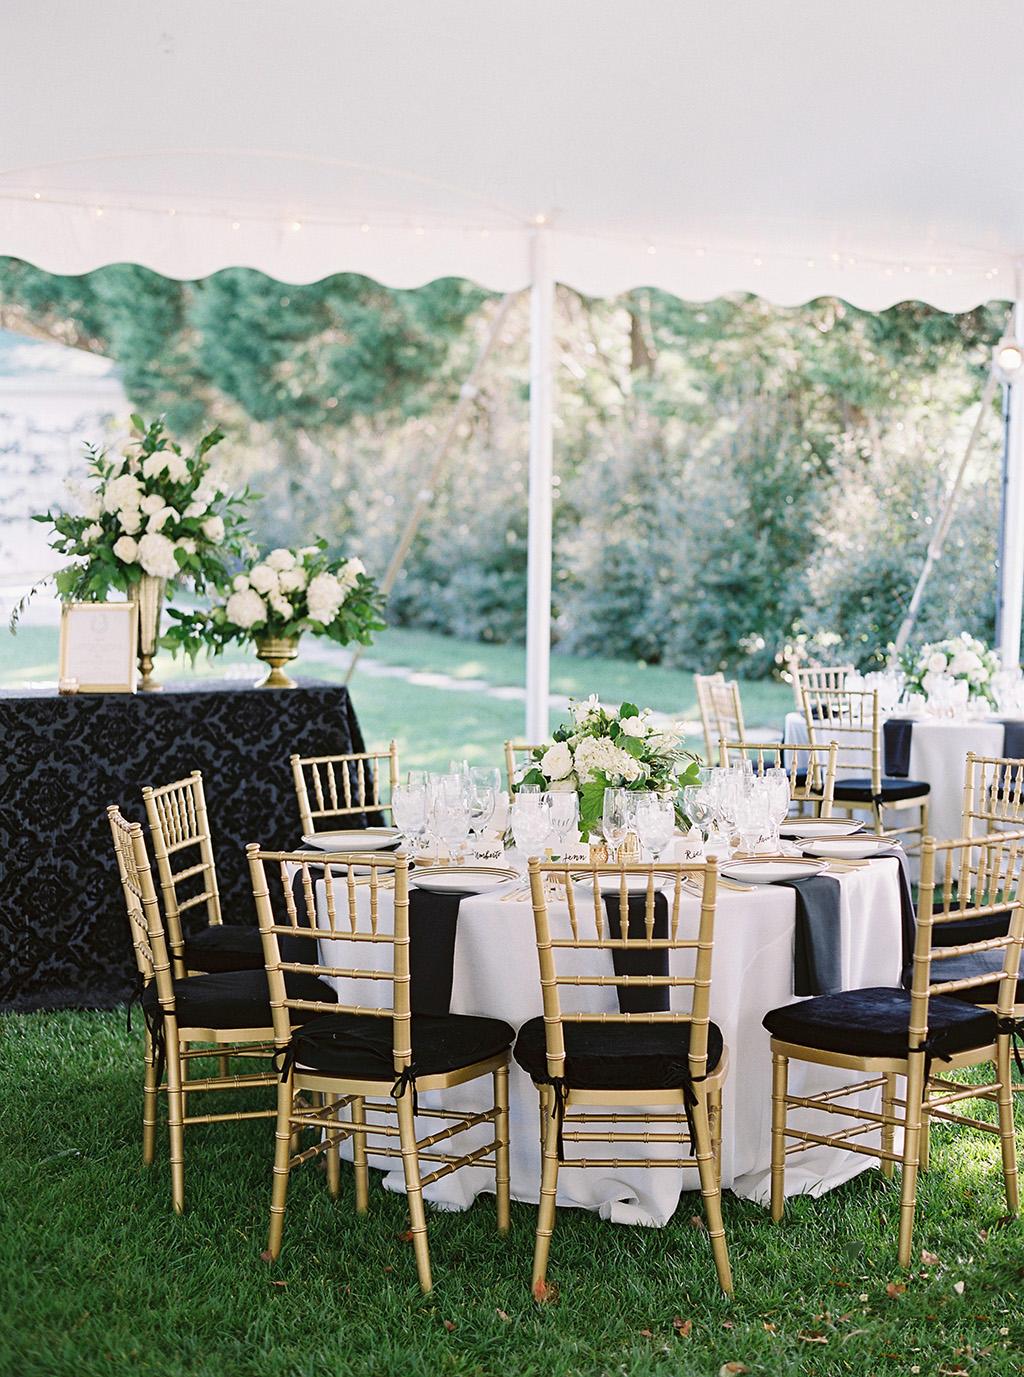 Amelia_Johnson_Photography_Antonella&Matthew_wedding0014.1